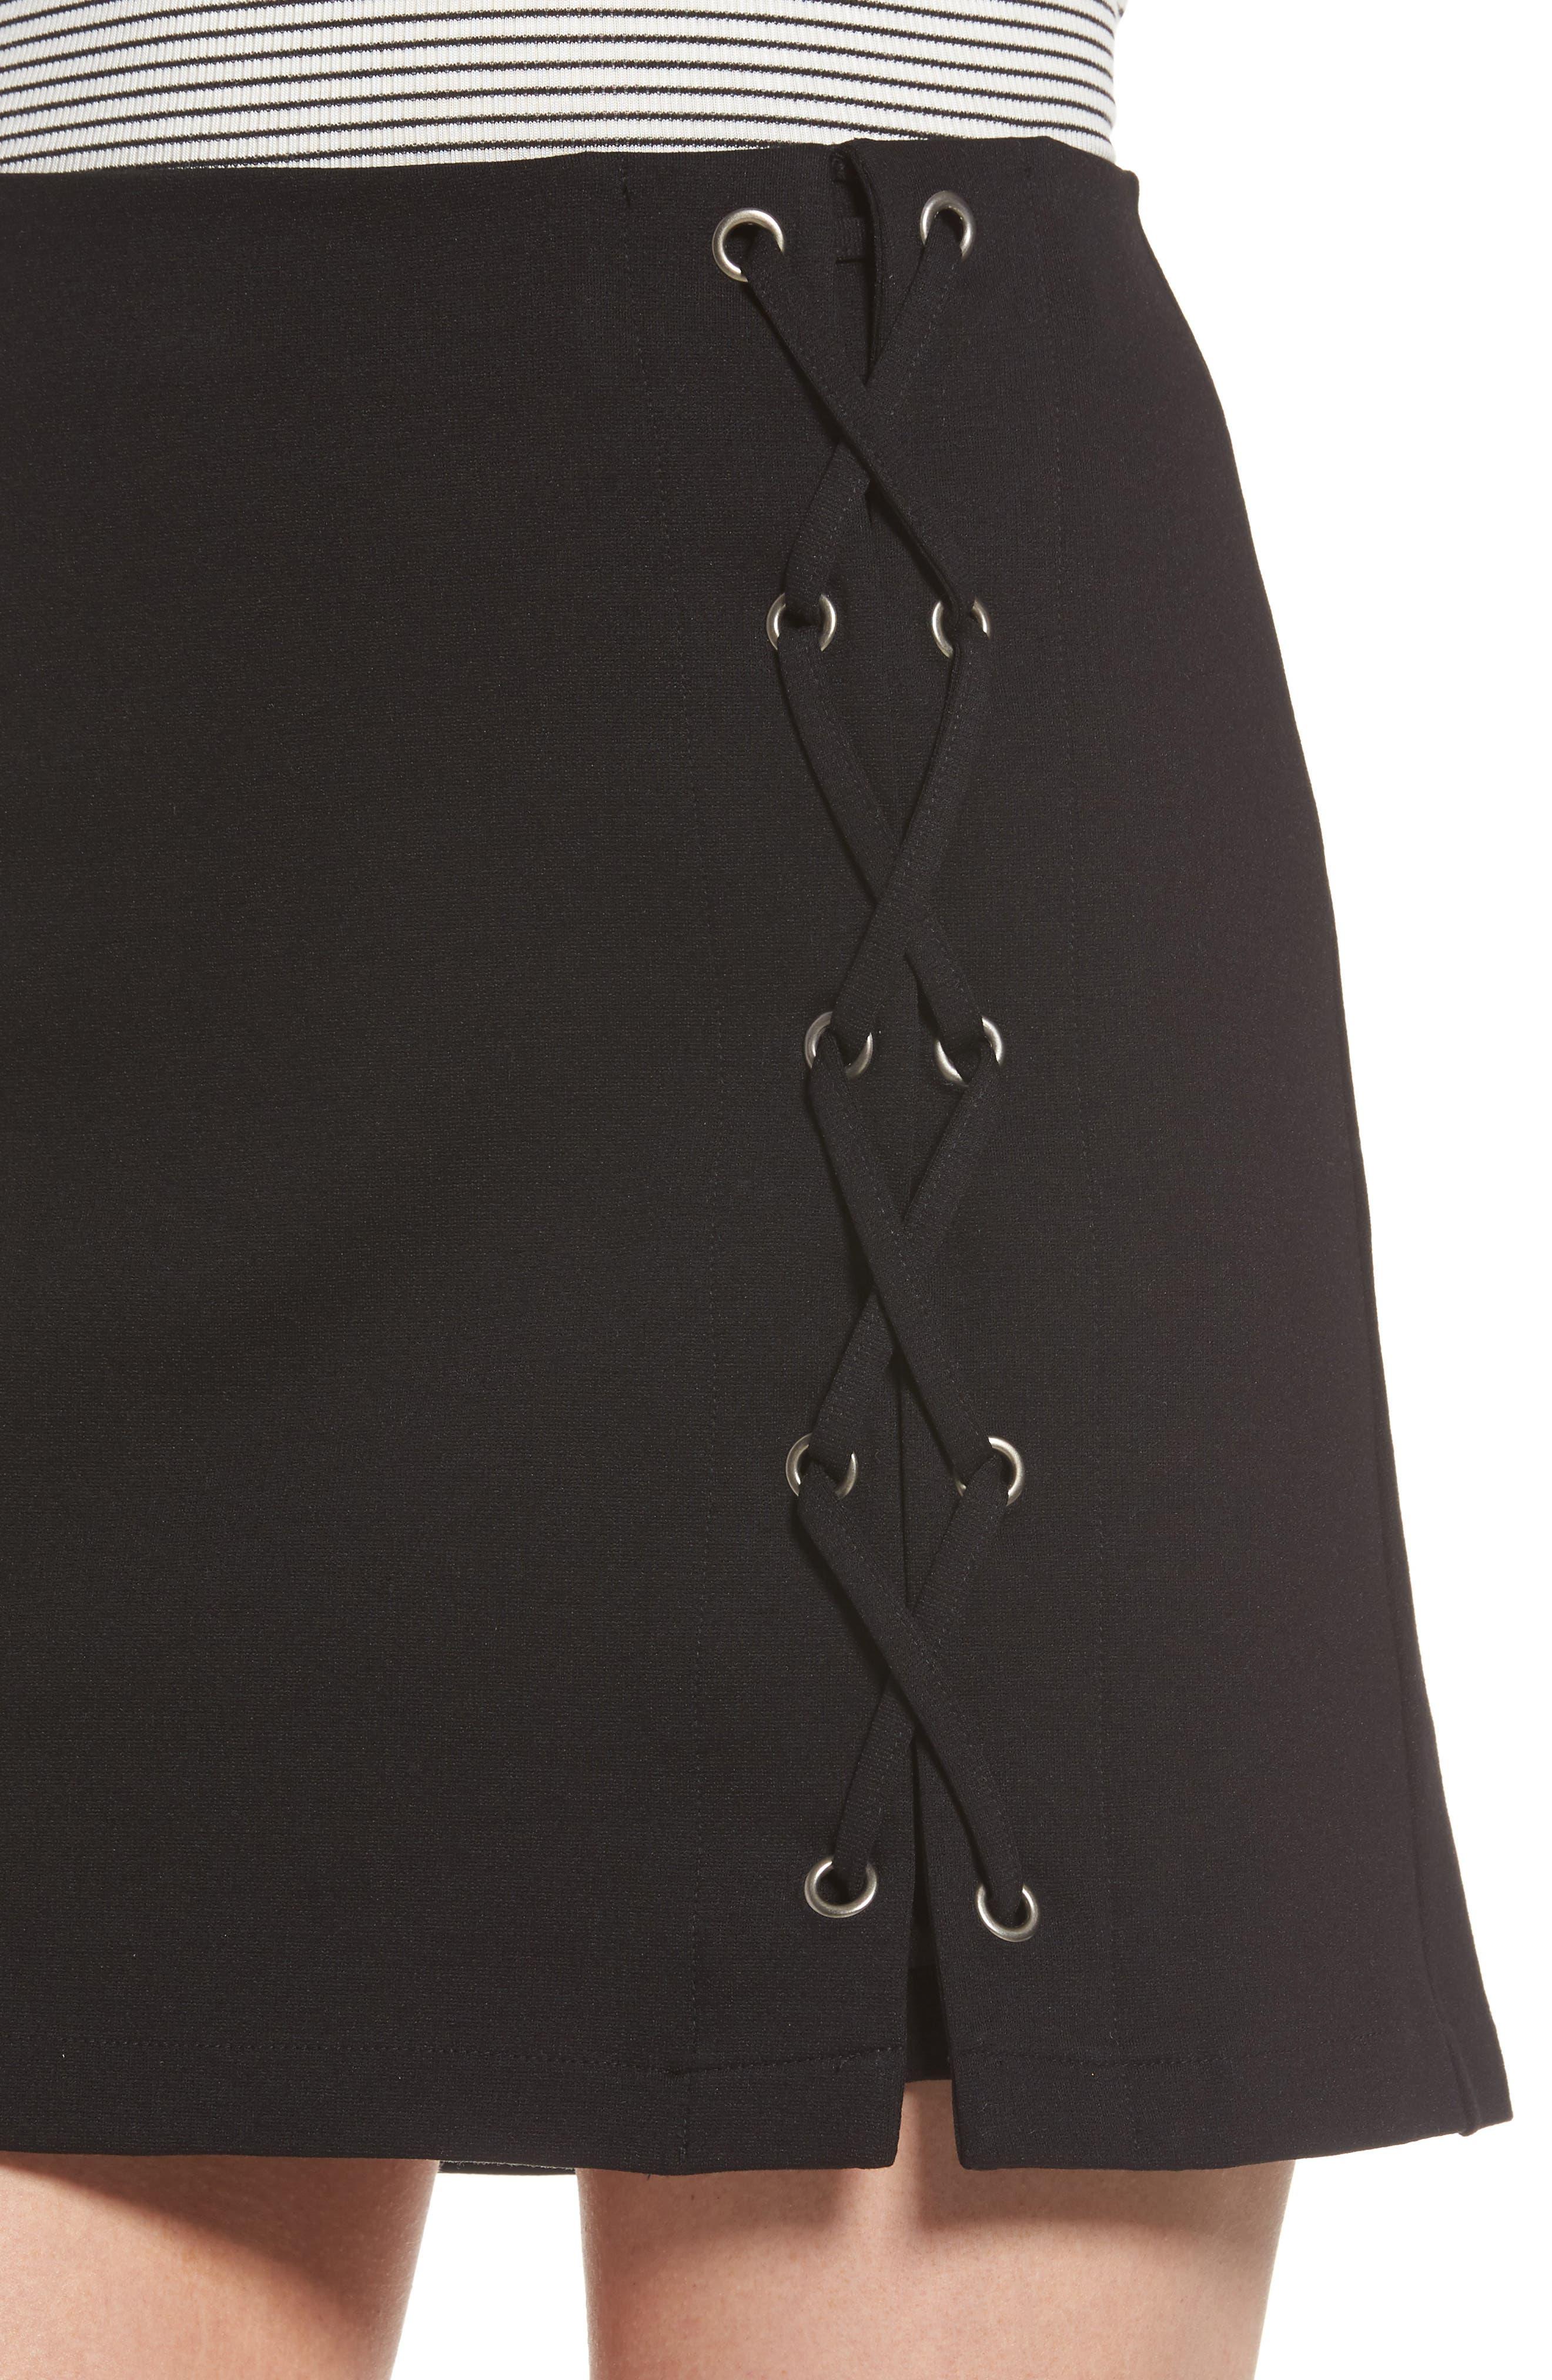 Grommet Lace-Up Miniskirt,                             Alternate thumbnail 4, color,